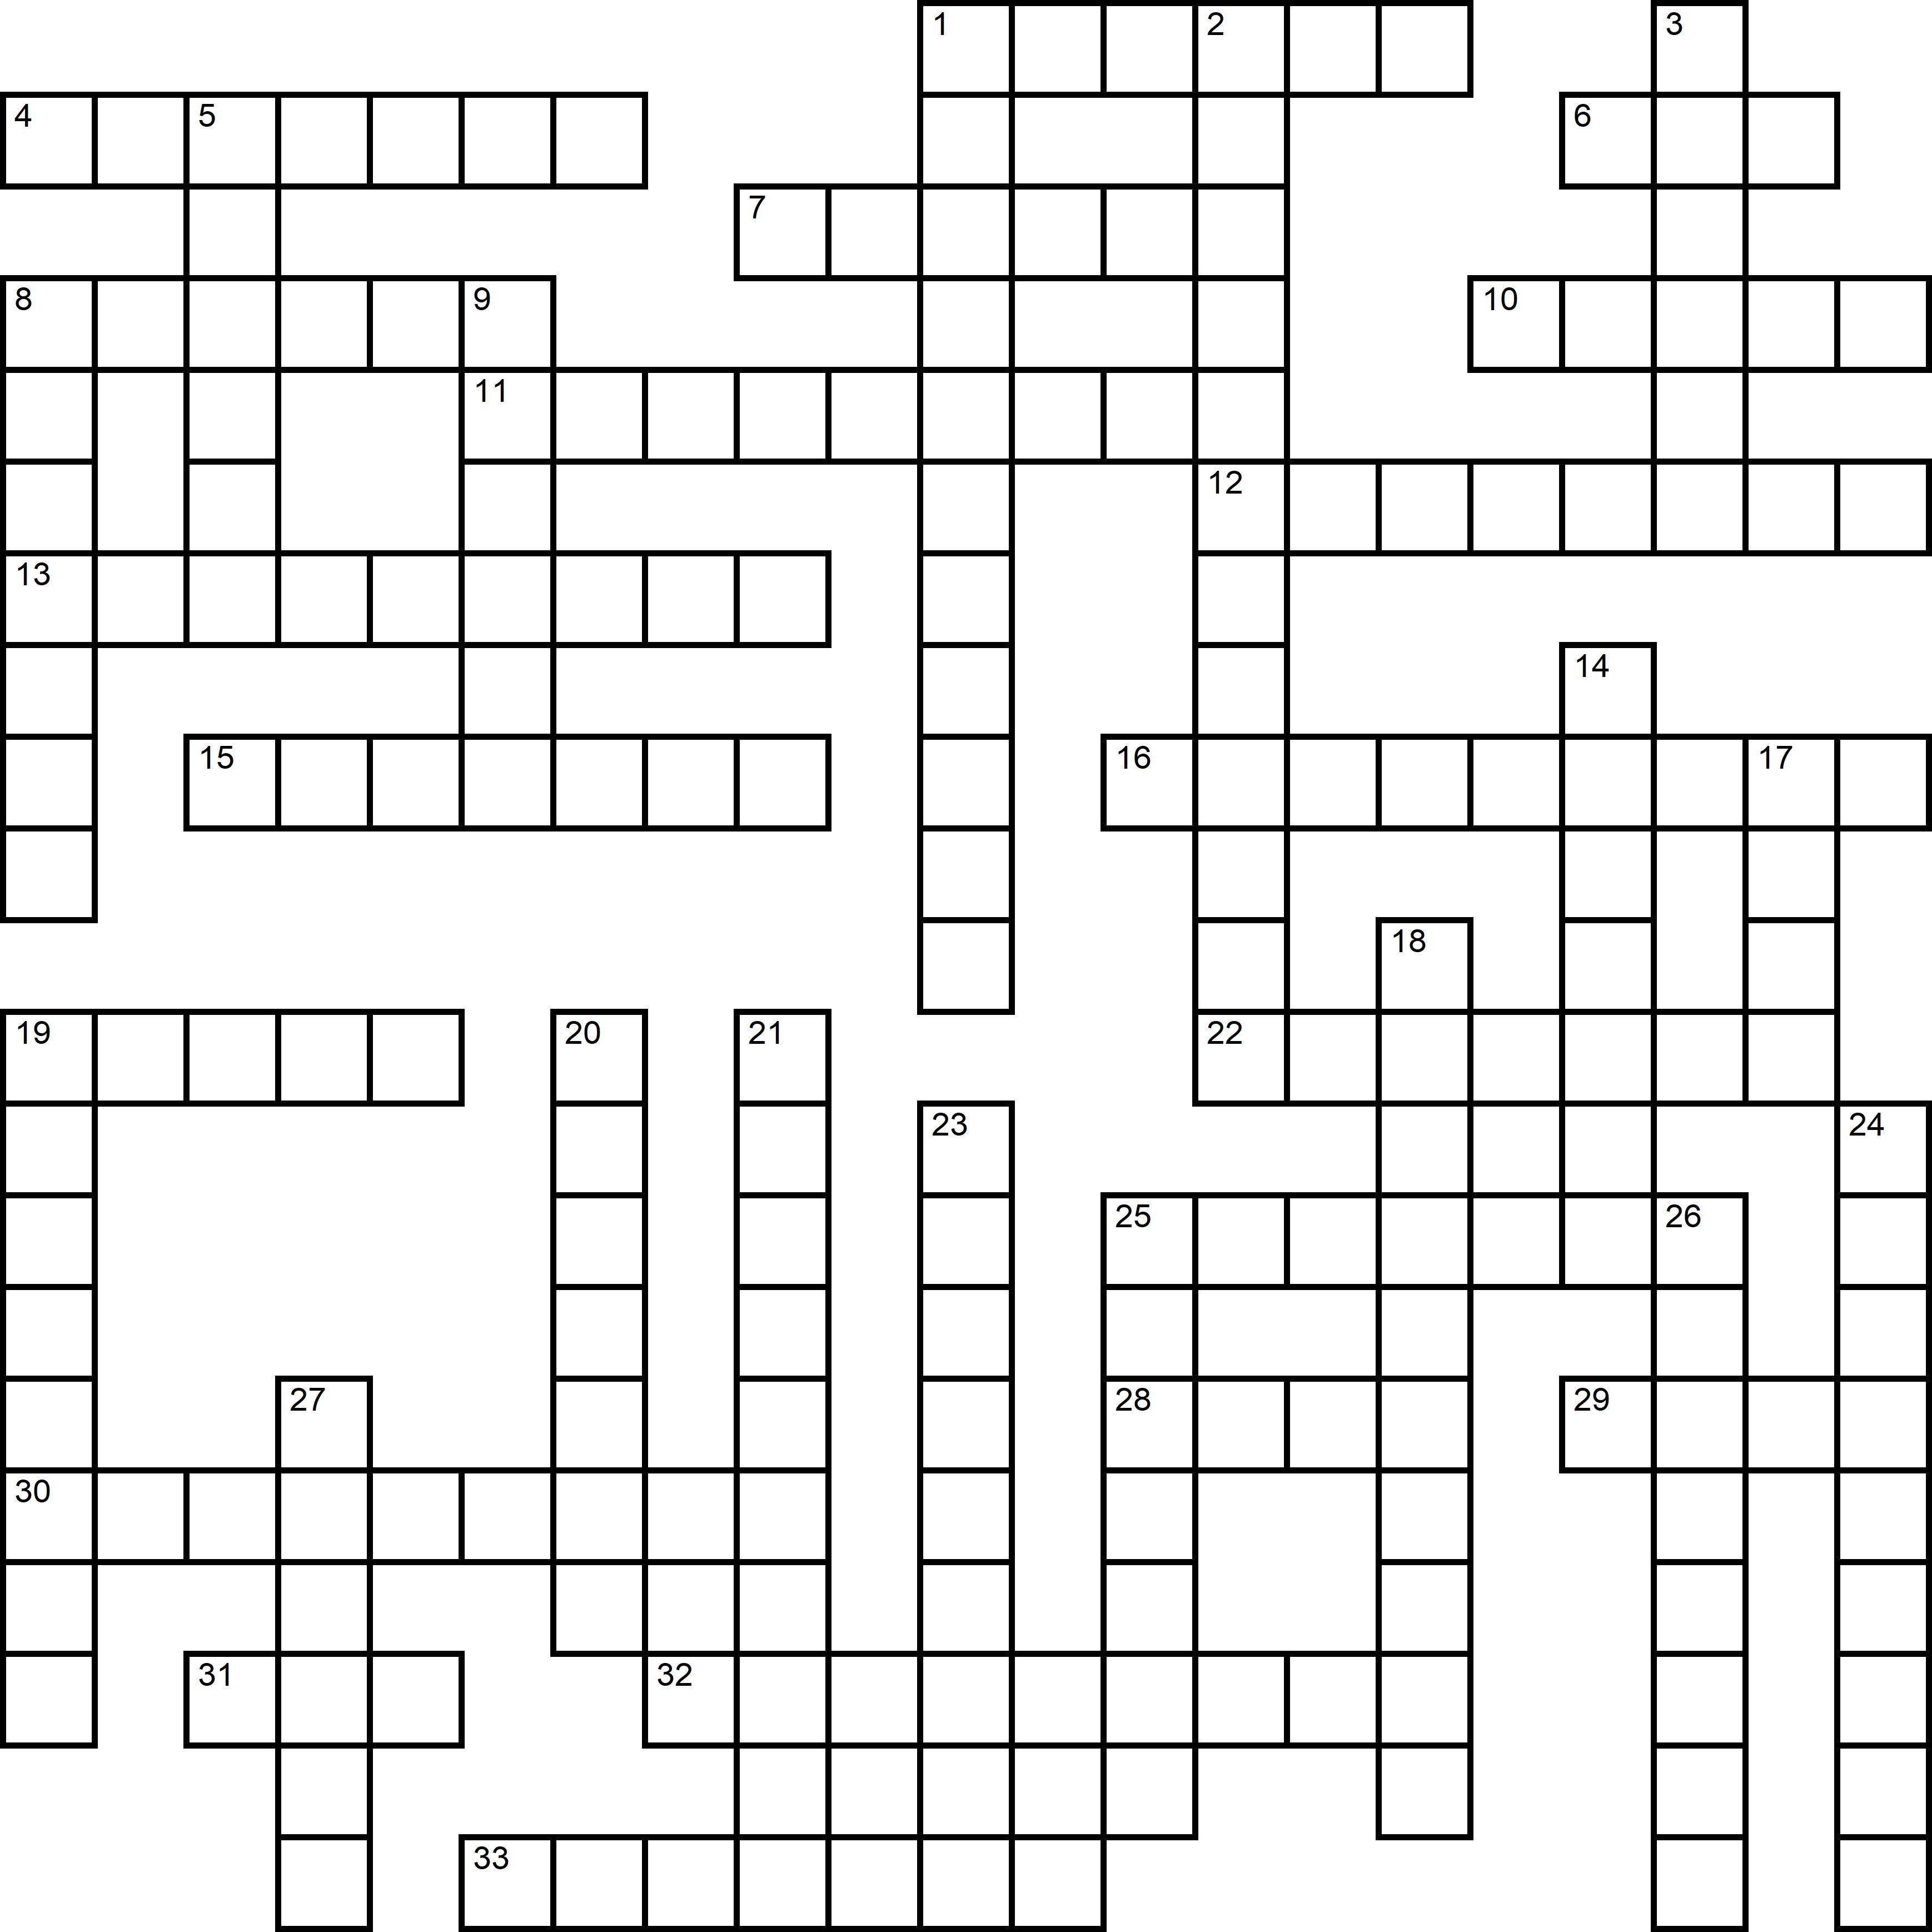 Easy Crossword About Sport